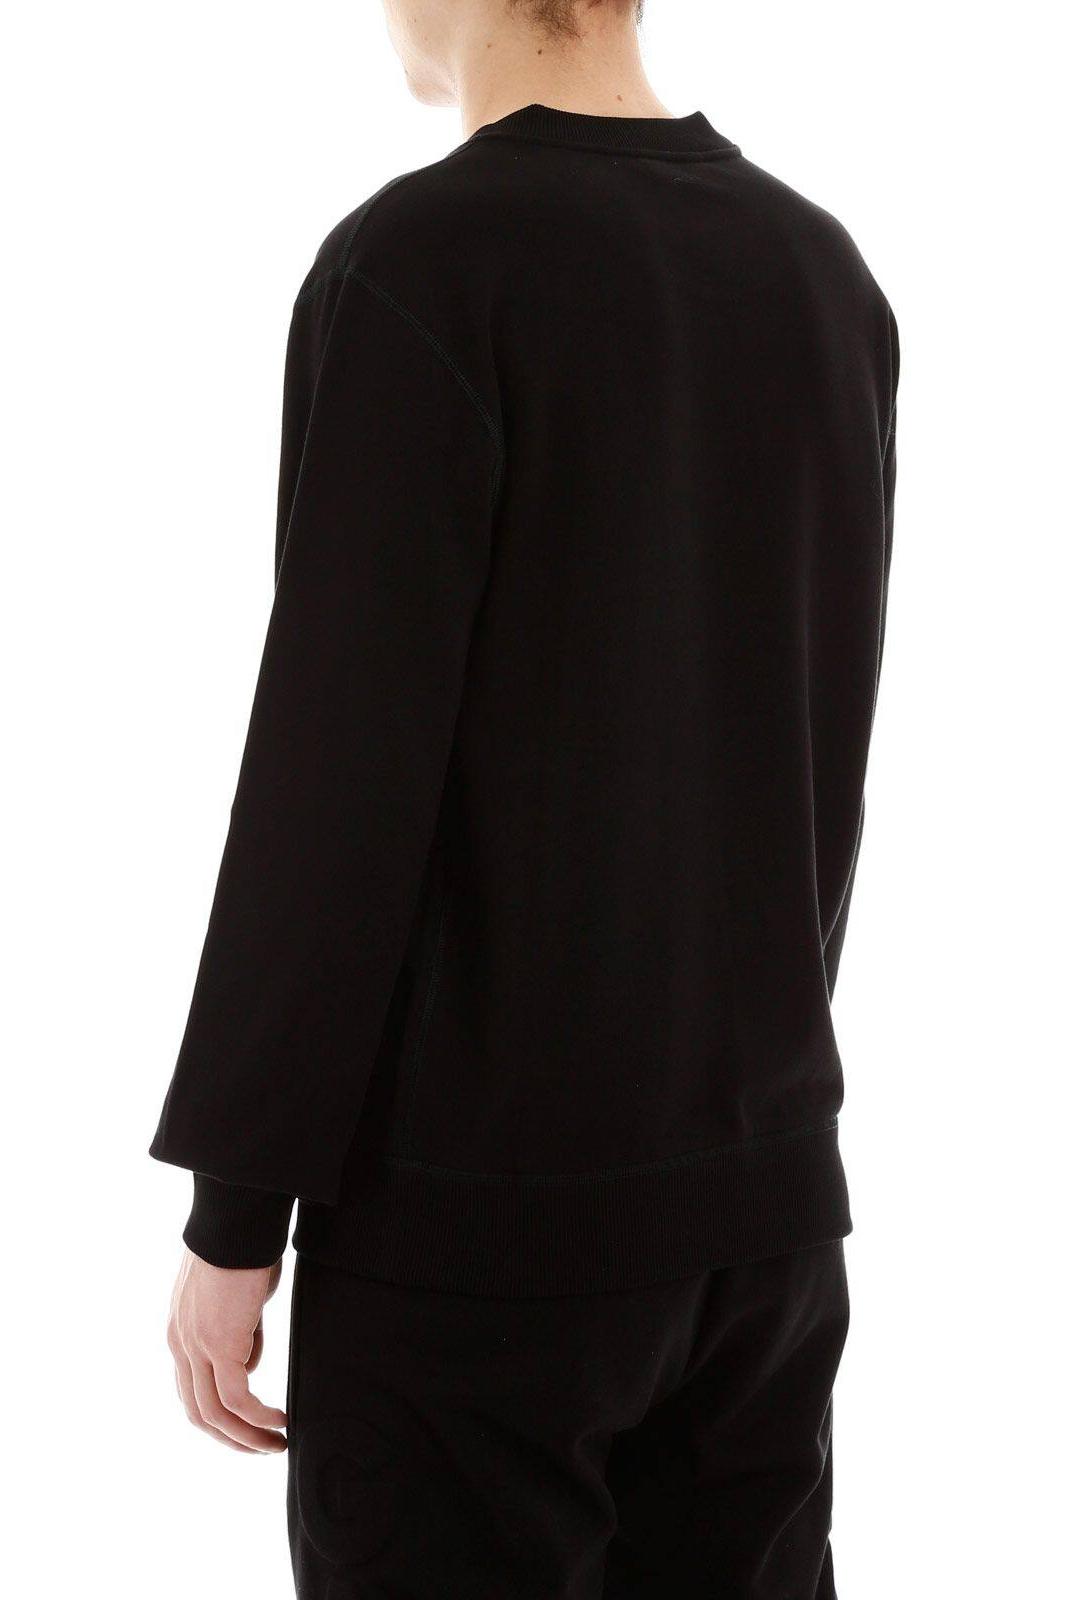 Sweatshirts  Dolce&Gabbana G9PD3T N0000 noir